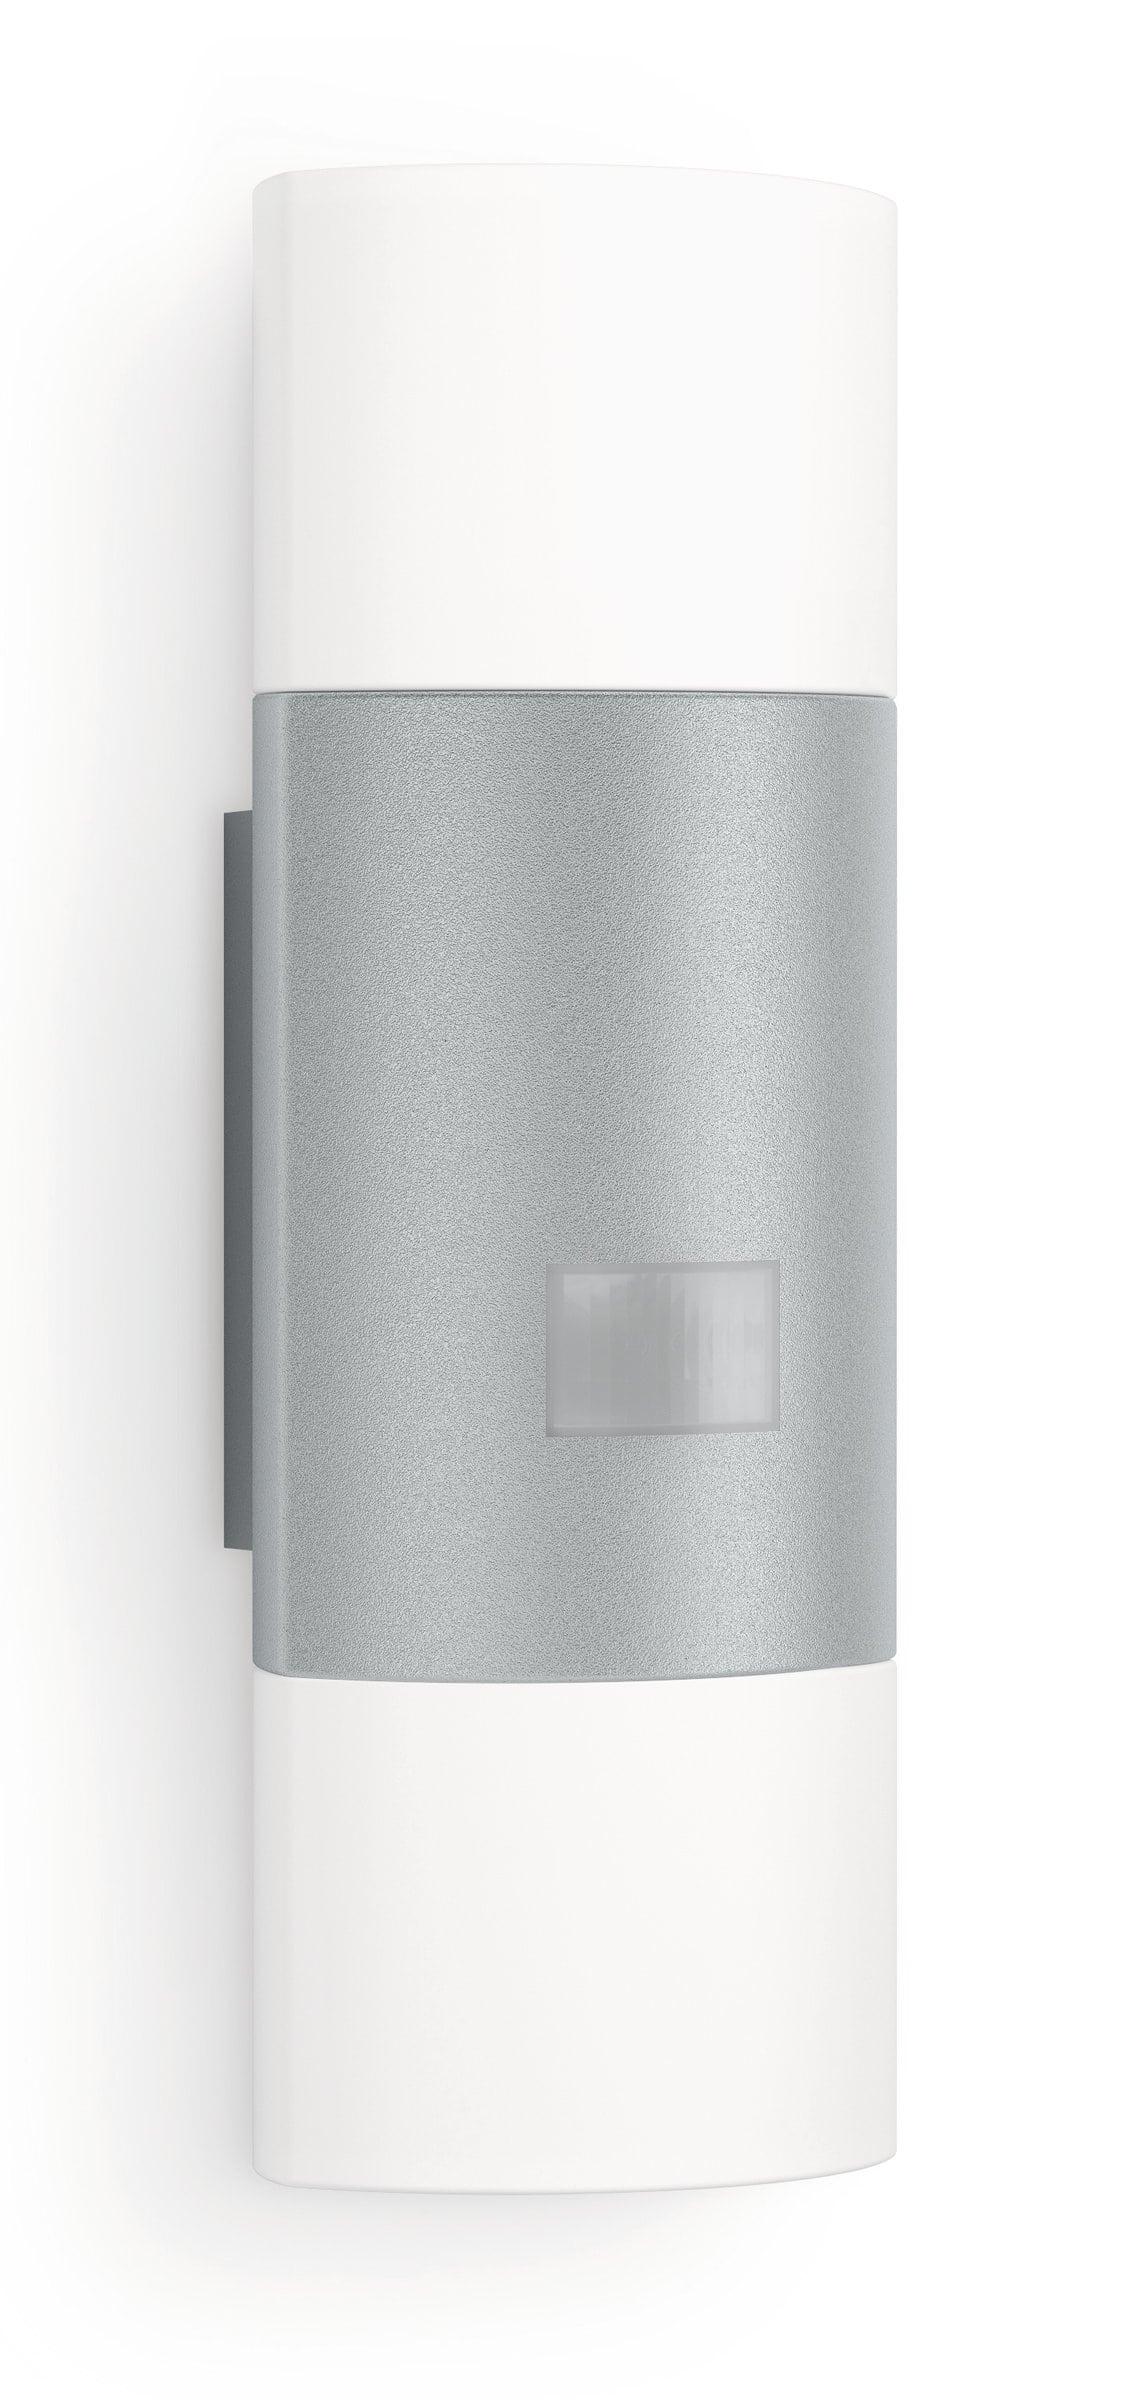 Steinel LED Up-/Downlight L 910 Aussenwandlampe